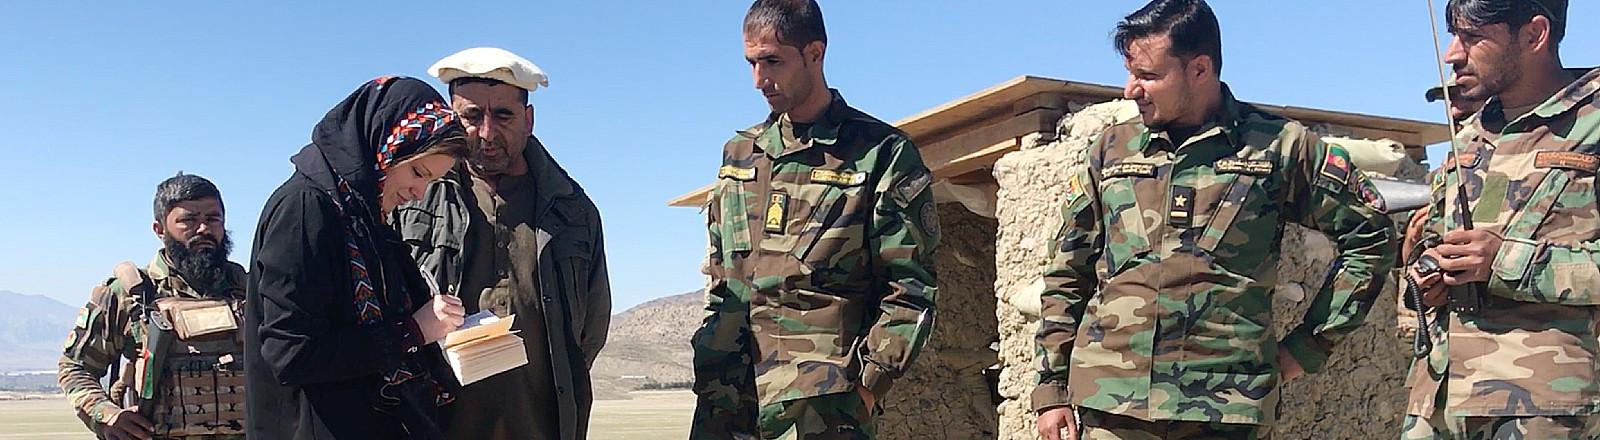 Stefanie Glinski in Afghanistan